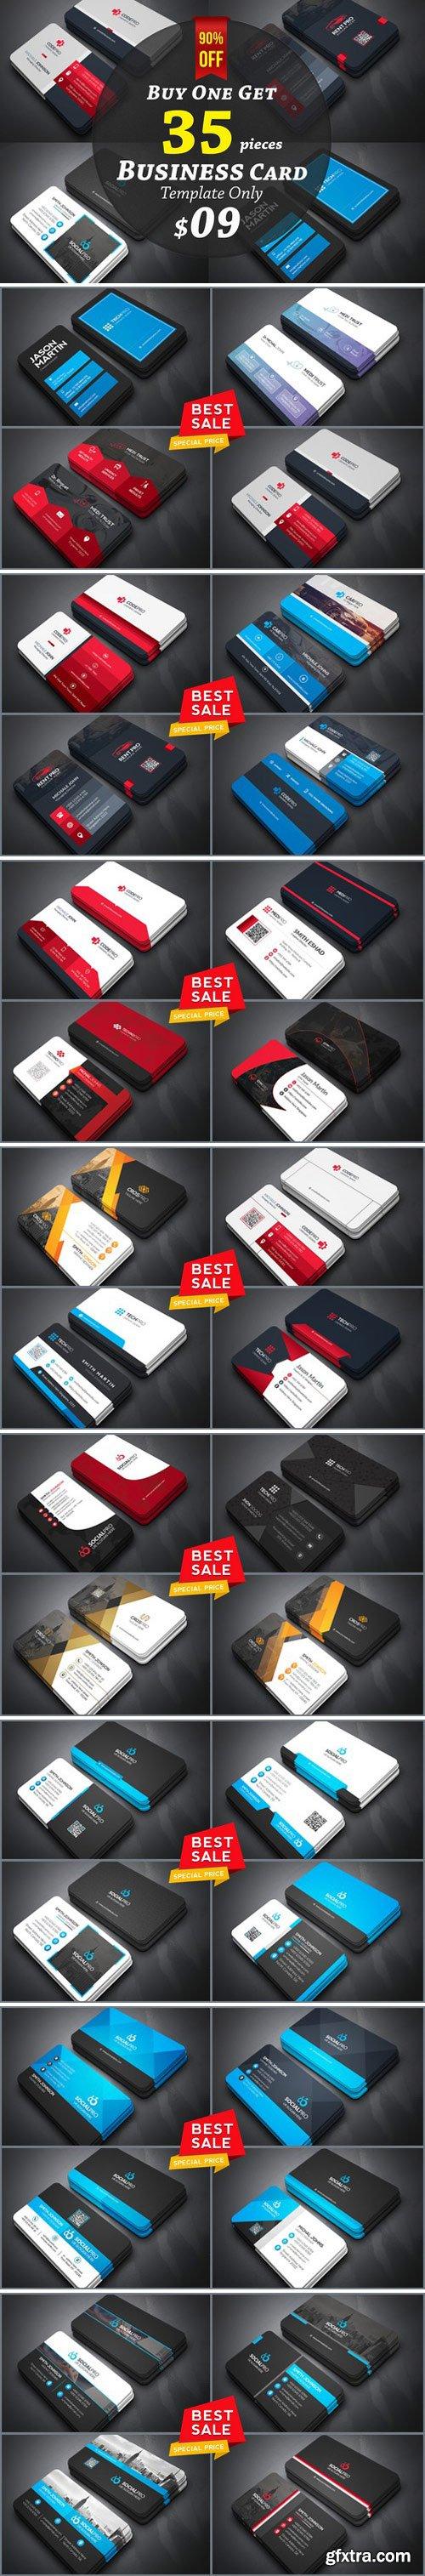 CM - 35 Business Cards Bundle 90% off 2102015